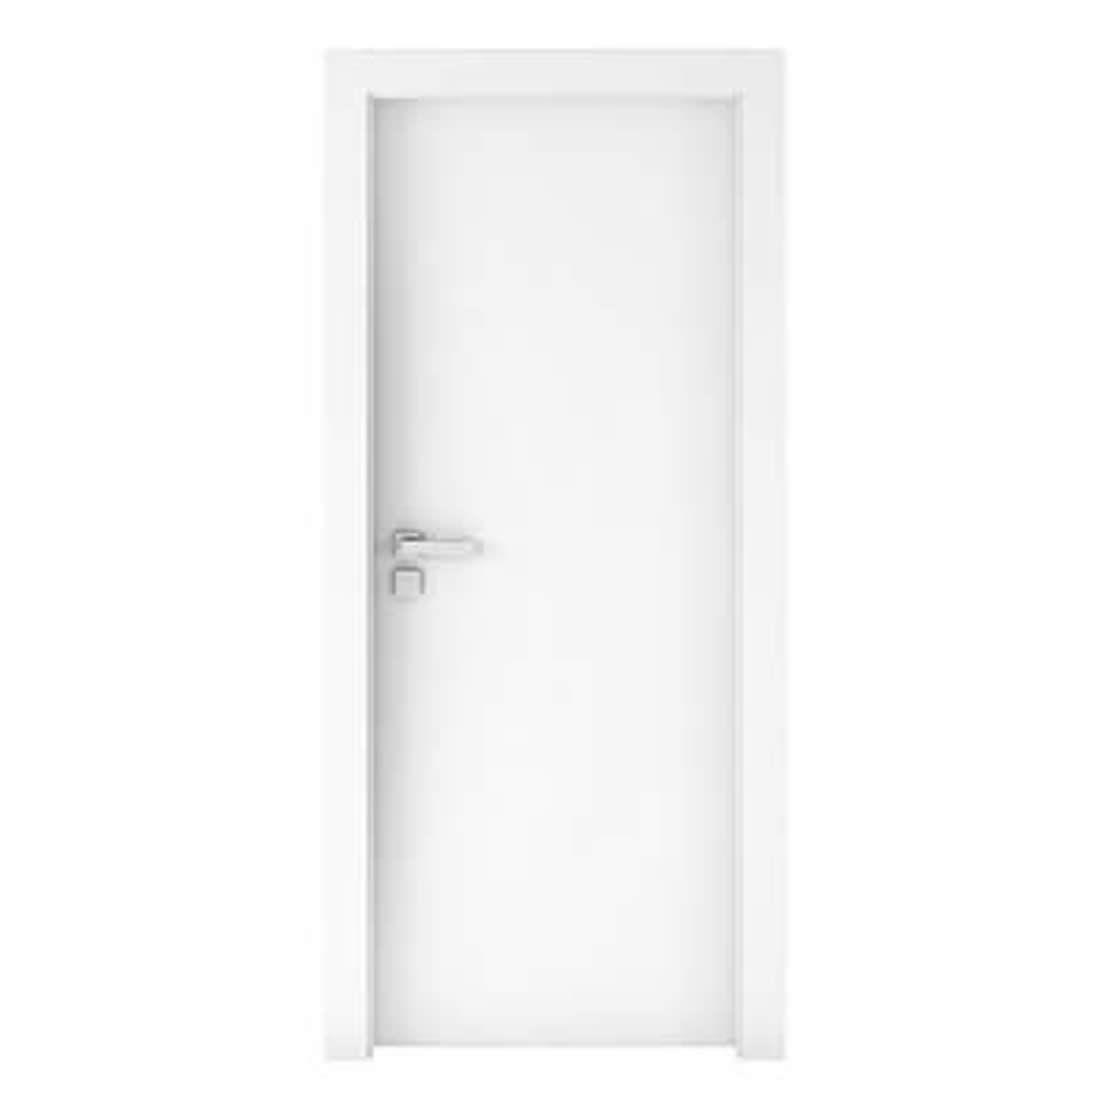 Kit Porta Concrem Wood 2,10 x 0,90 x 3,5 cm Direita Branca